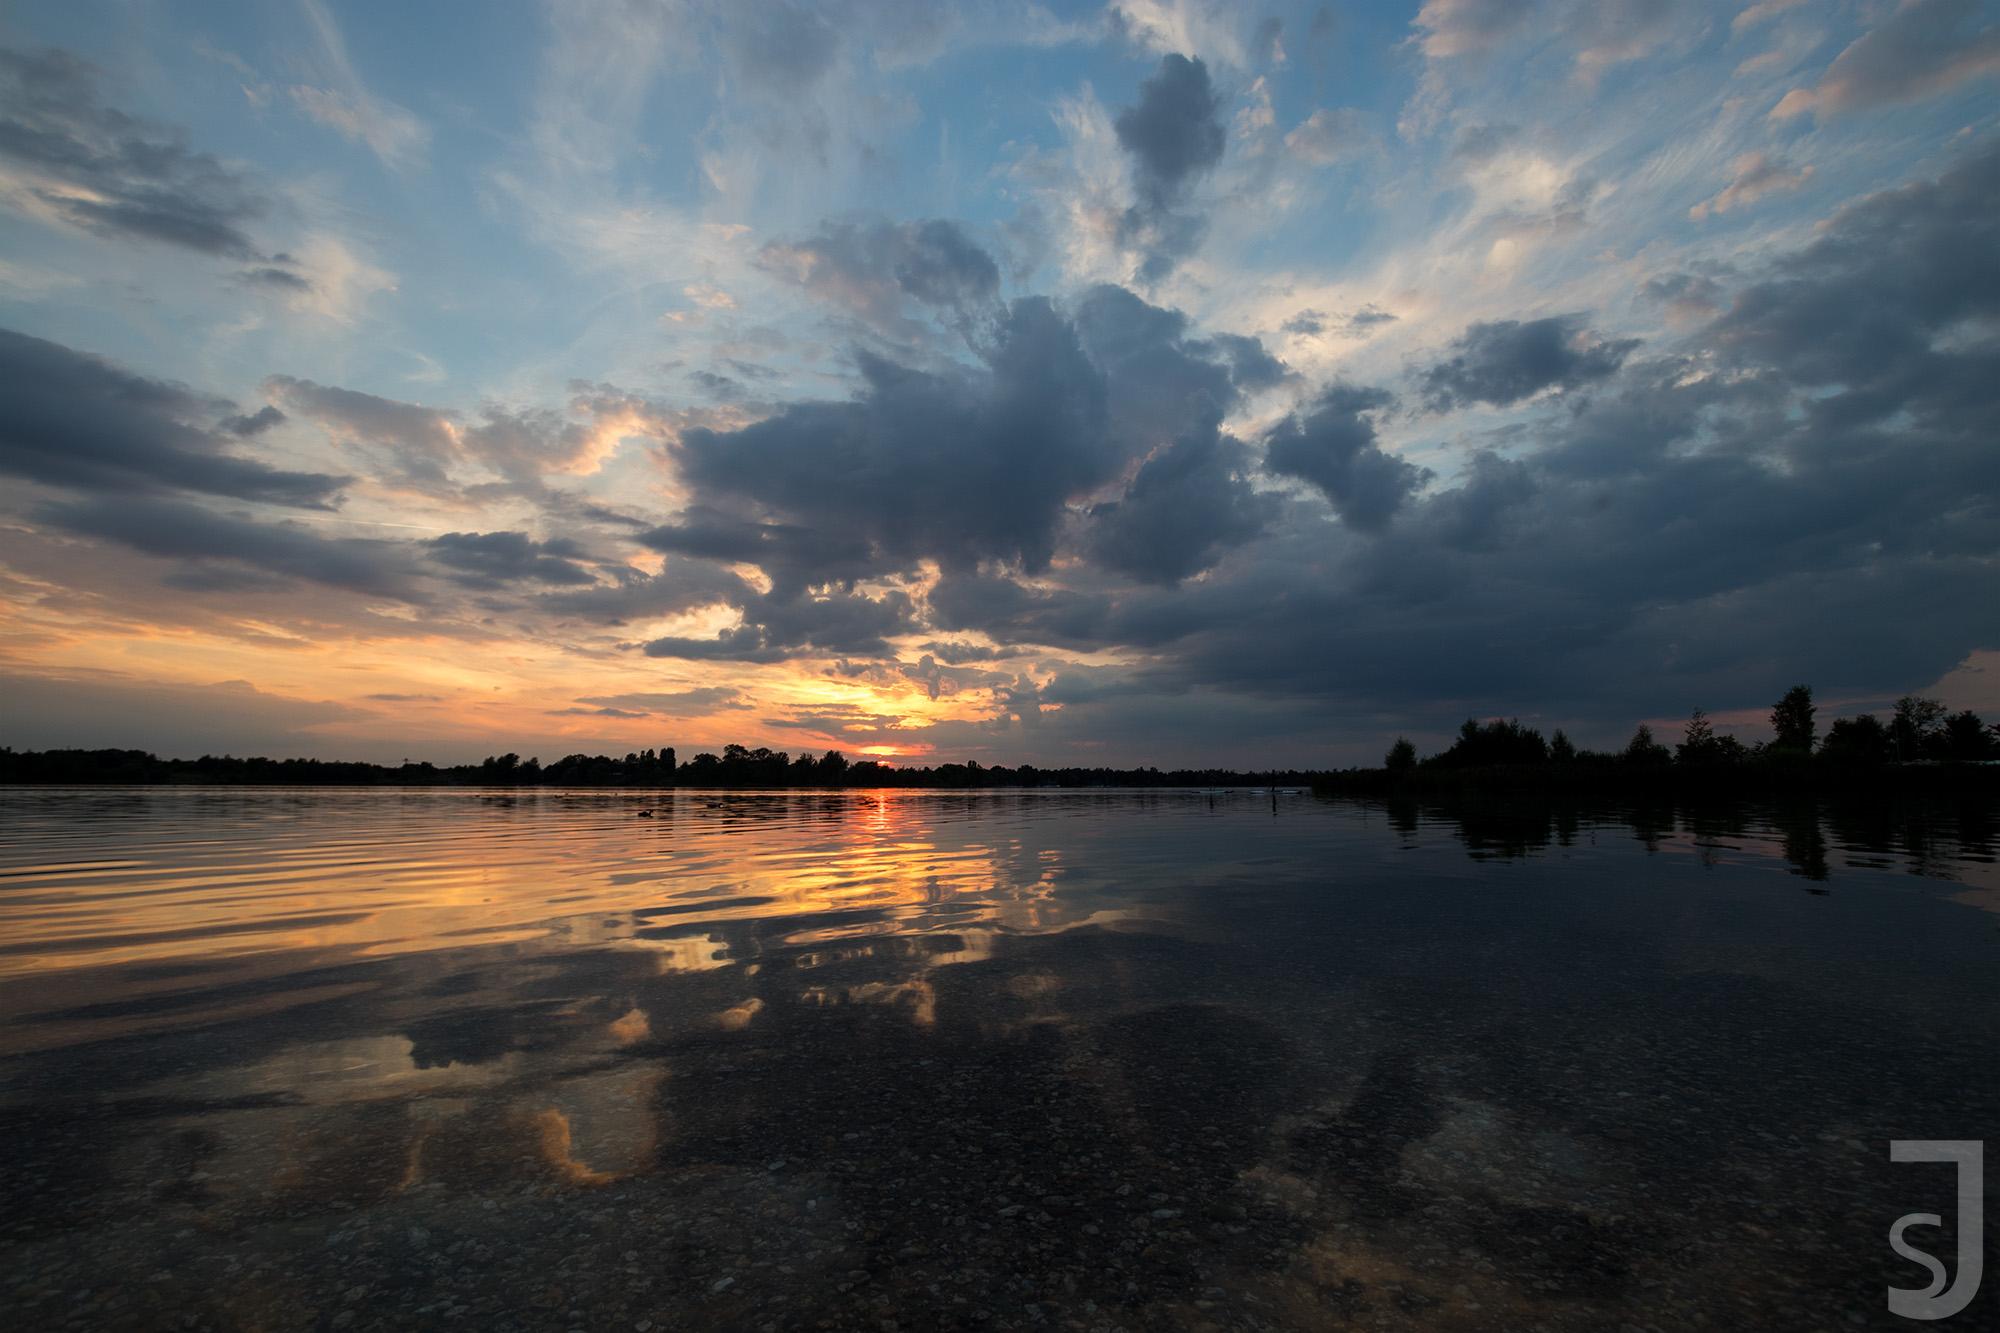 Sonnenuntergang Kulkwitzer See, Leipzig